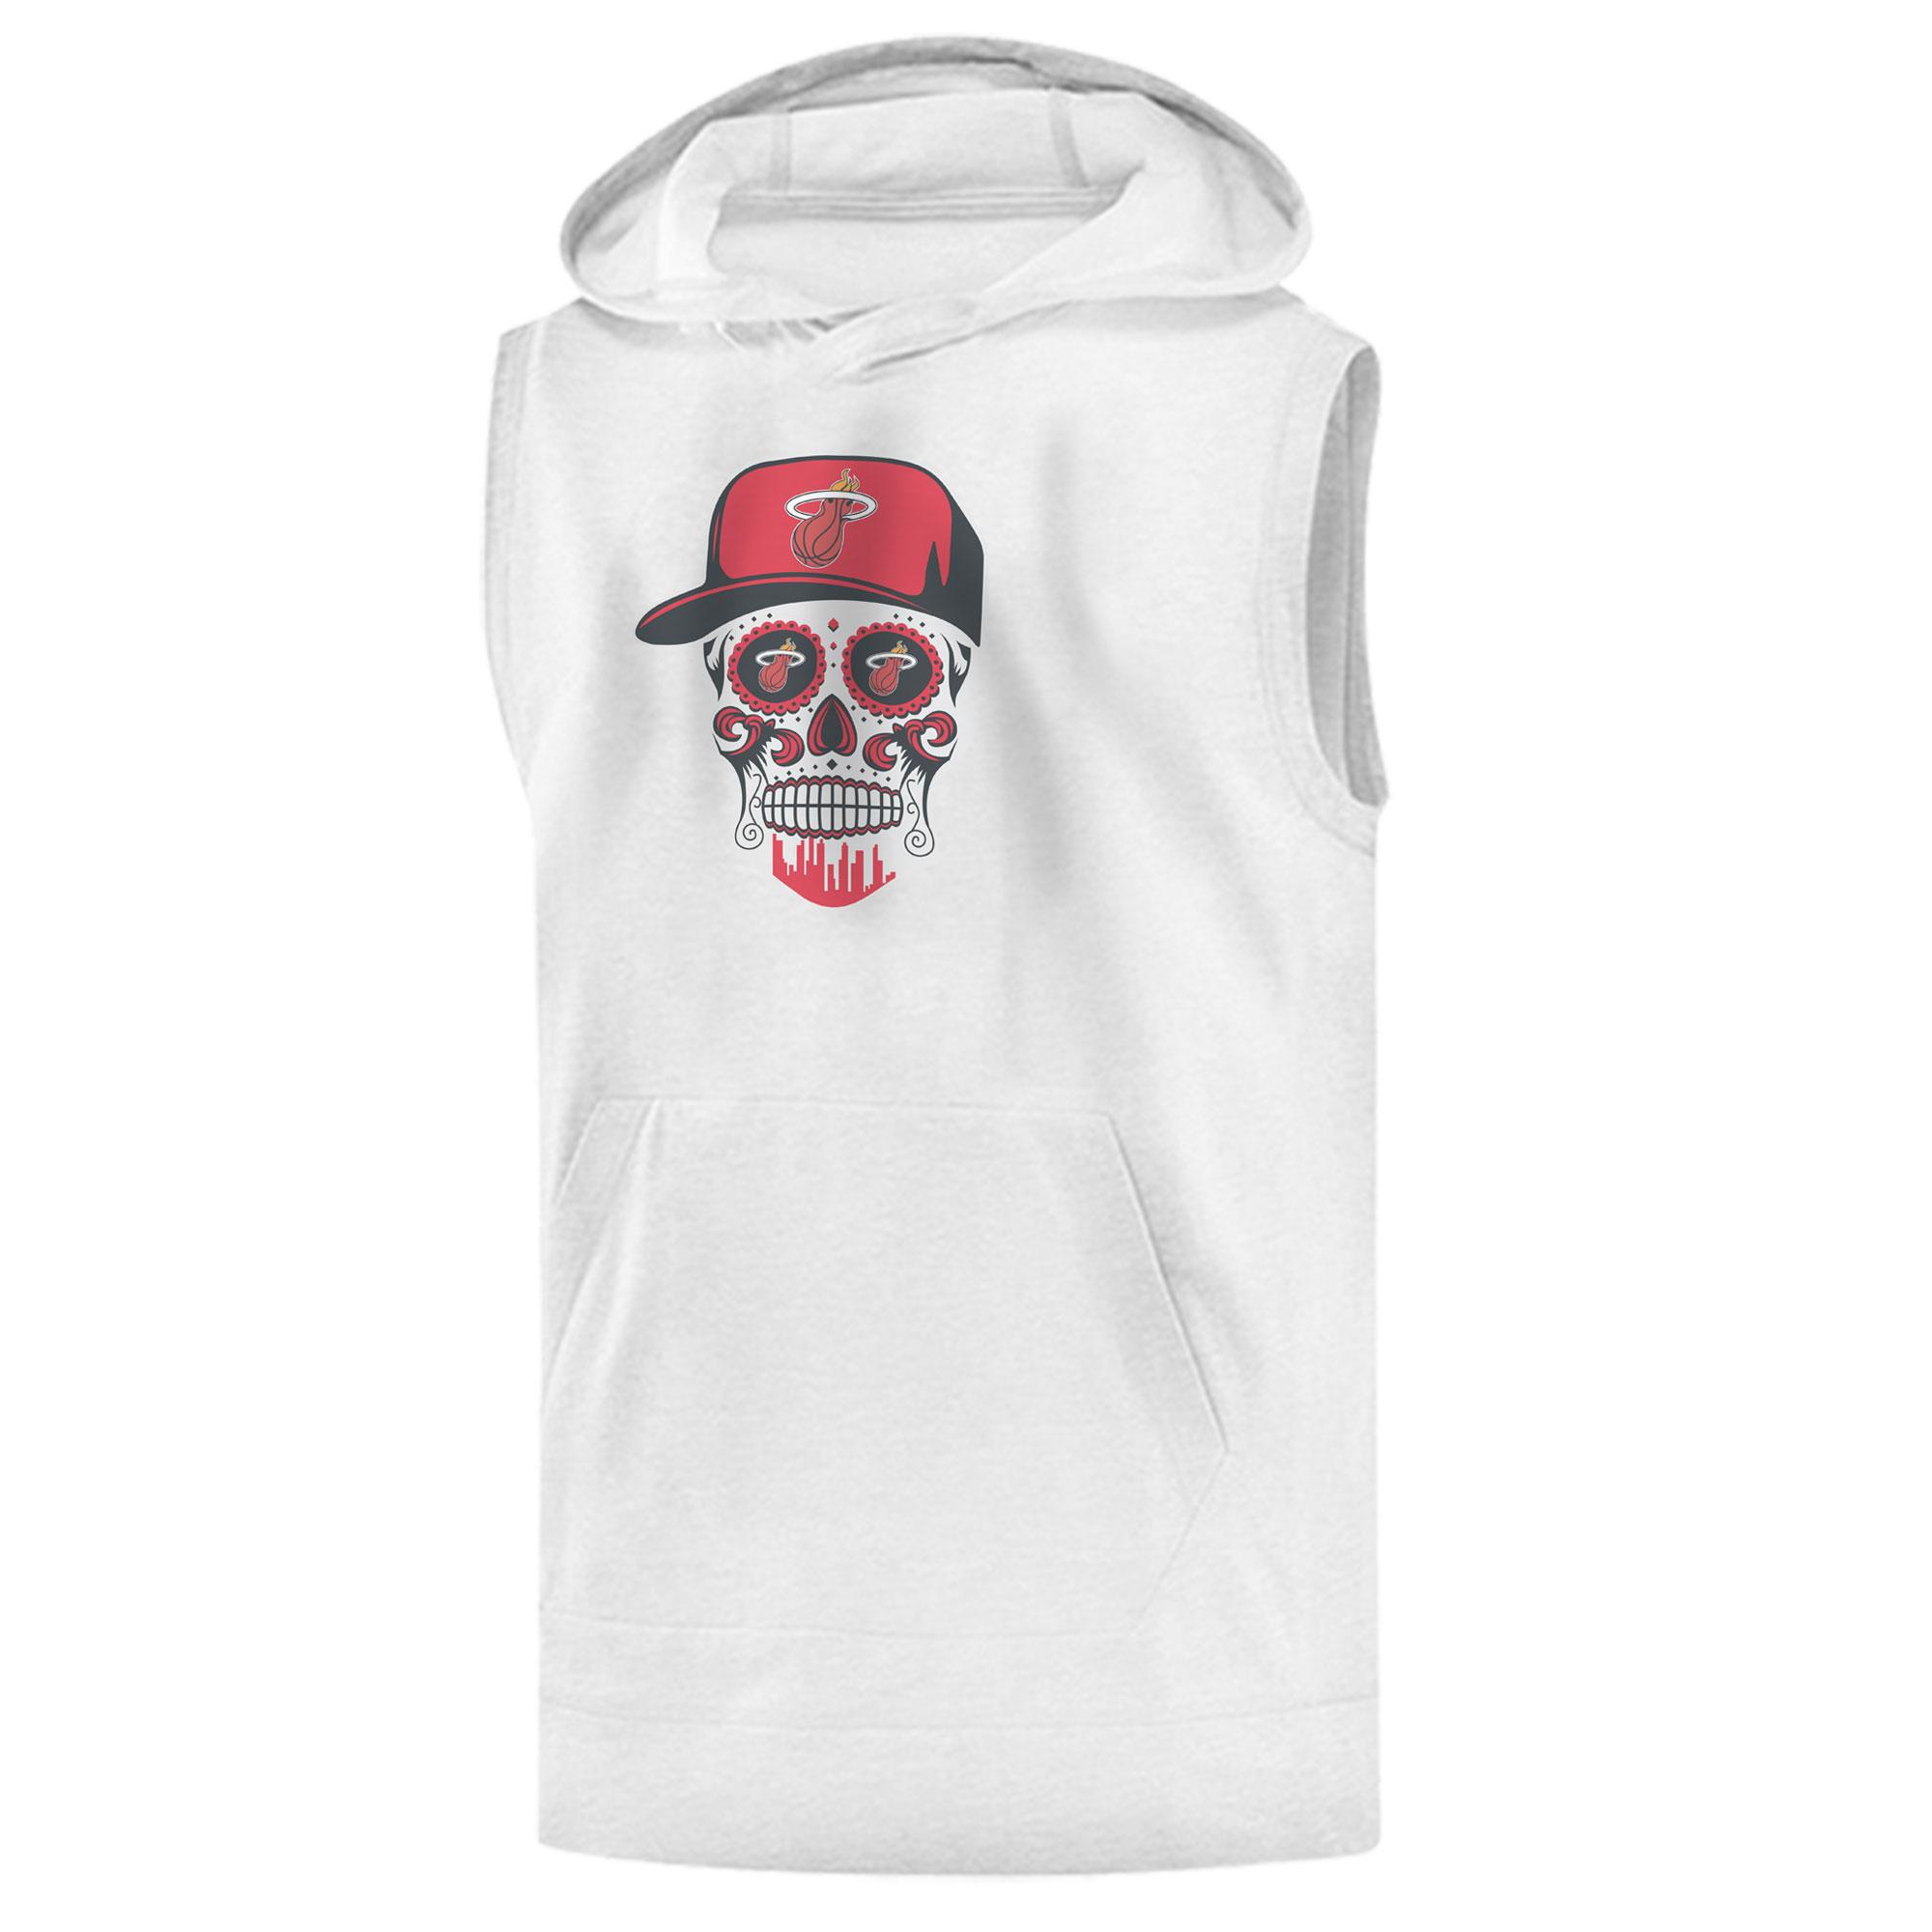 Heat Skull Sleeveless (KLS-WHT-NP-456-NBA-MIAMI-SKULL)